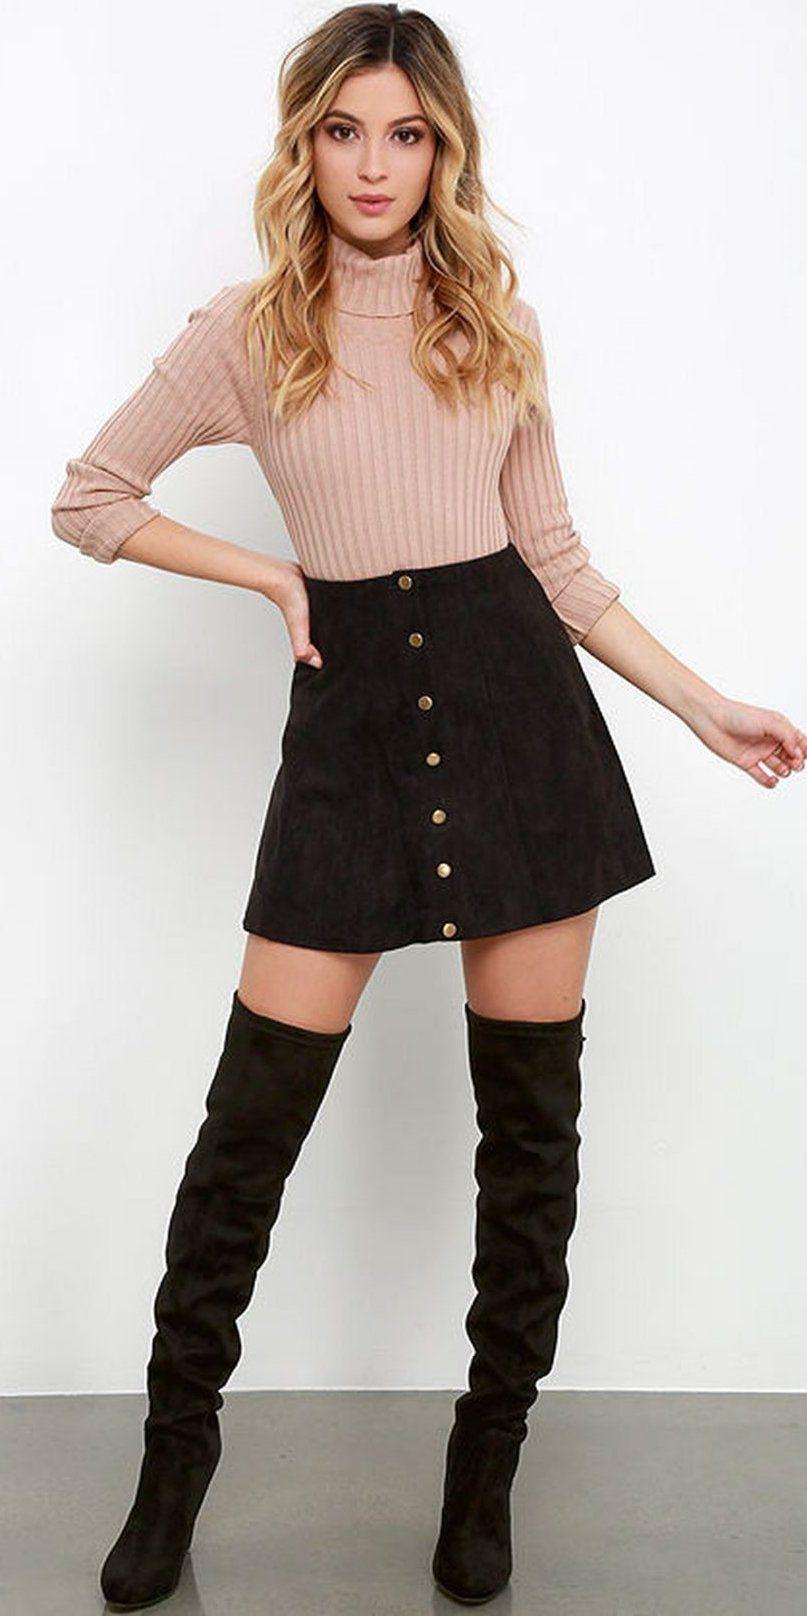 34a52fb07 Black Mini Skirt Winter Outfits - raveitsafe